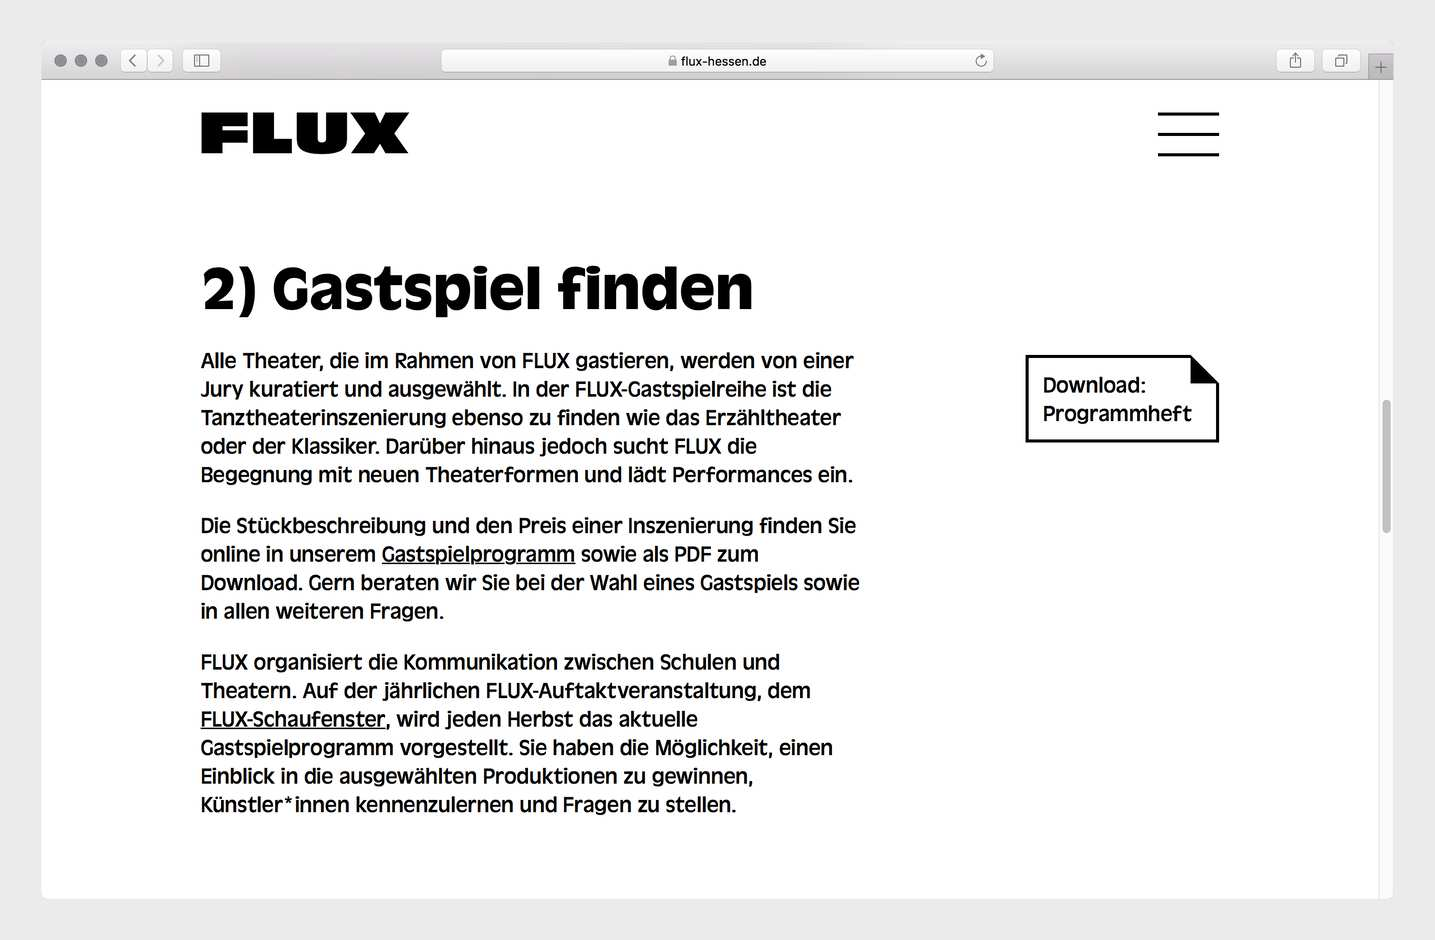 flux-website-7-1435x940px